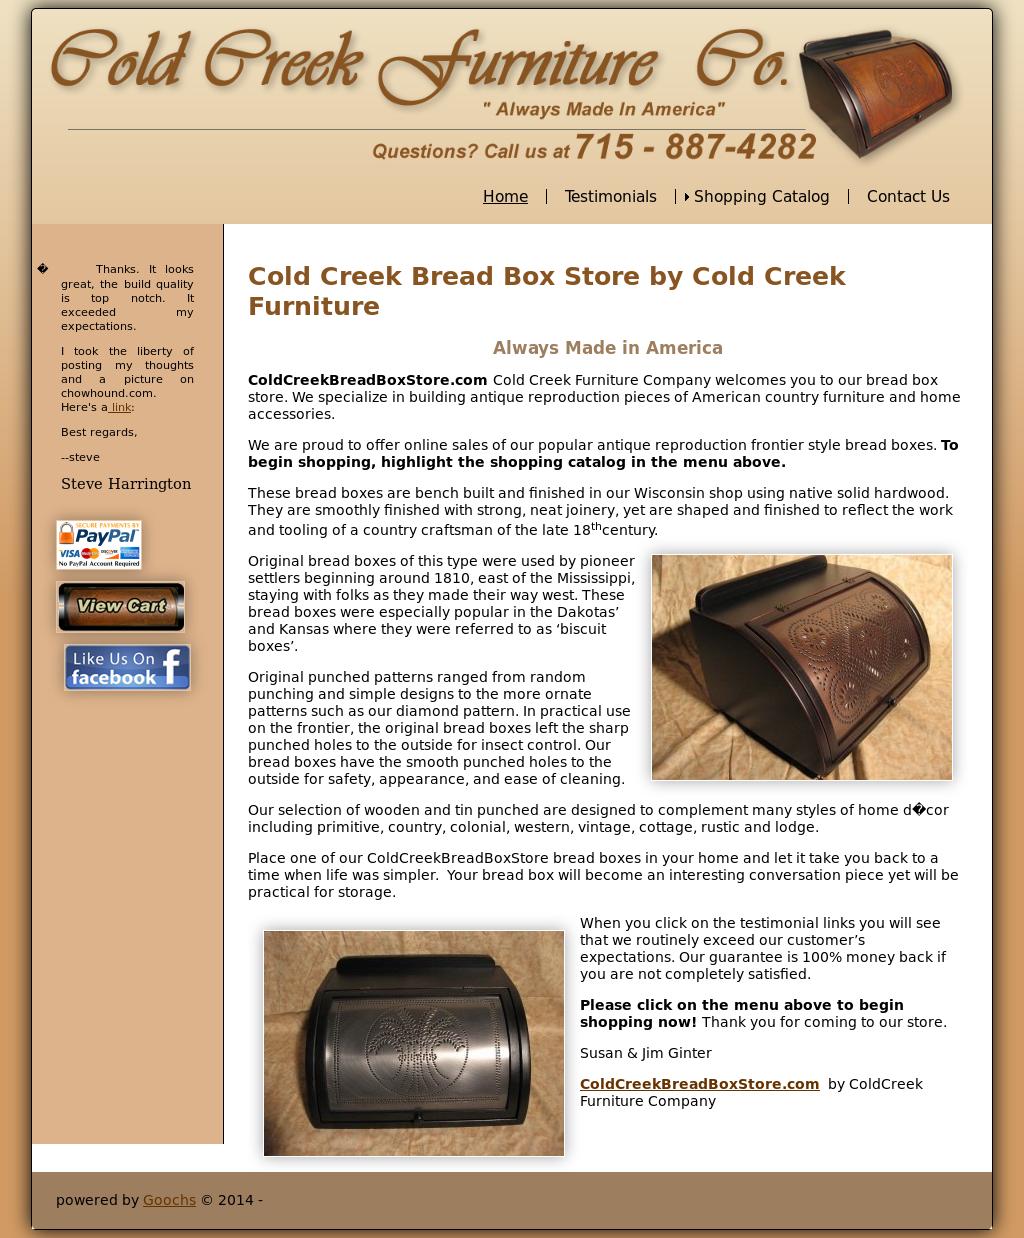 Cold Creek Furniture Company